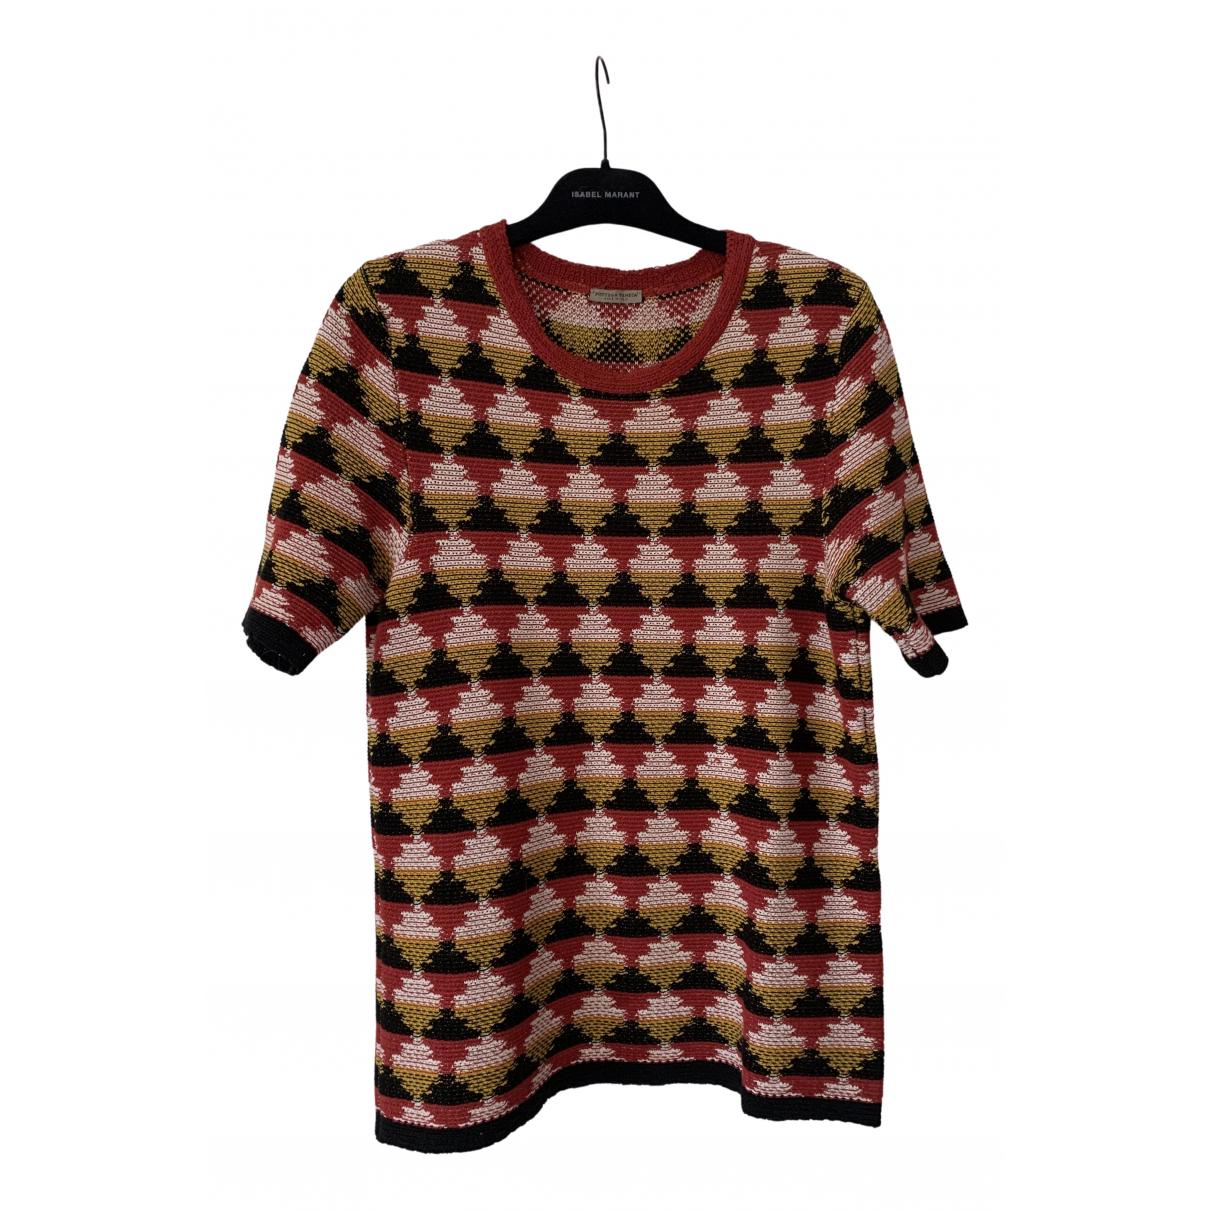 Bottega Veneta \N Multicolour Cotton Knitwear for Women 42 IT